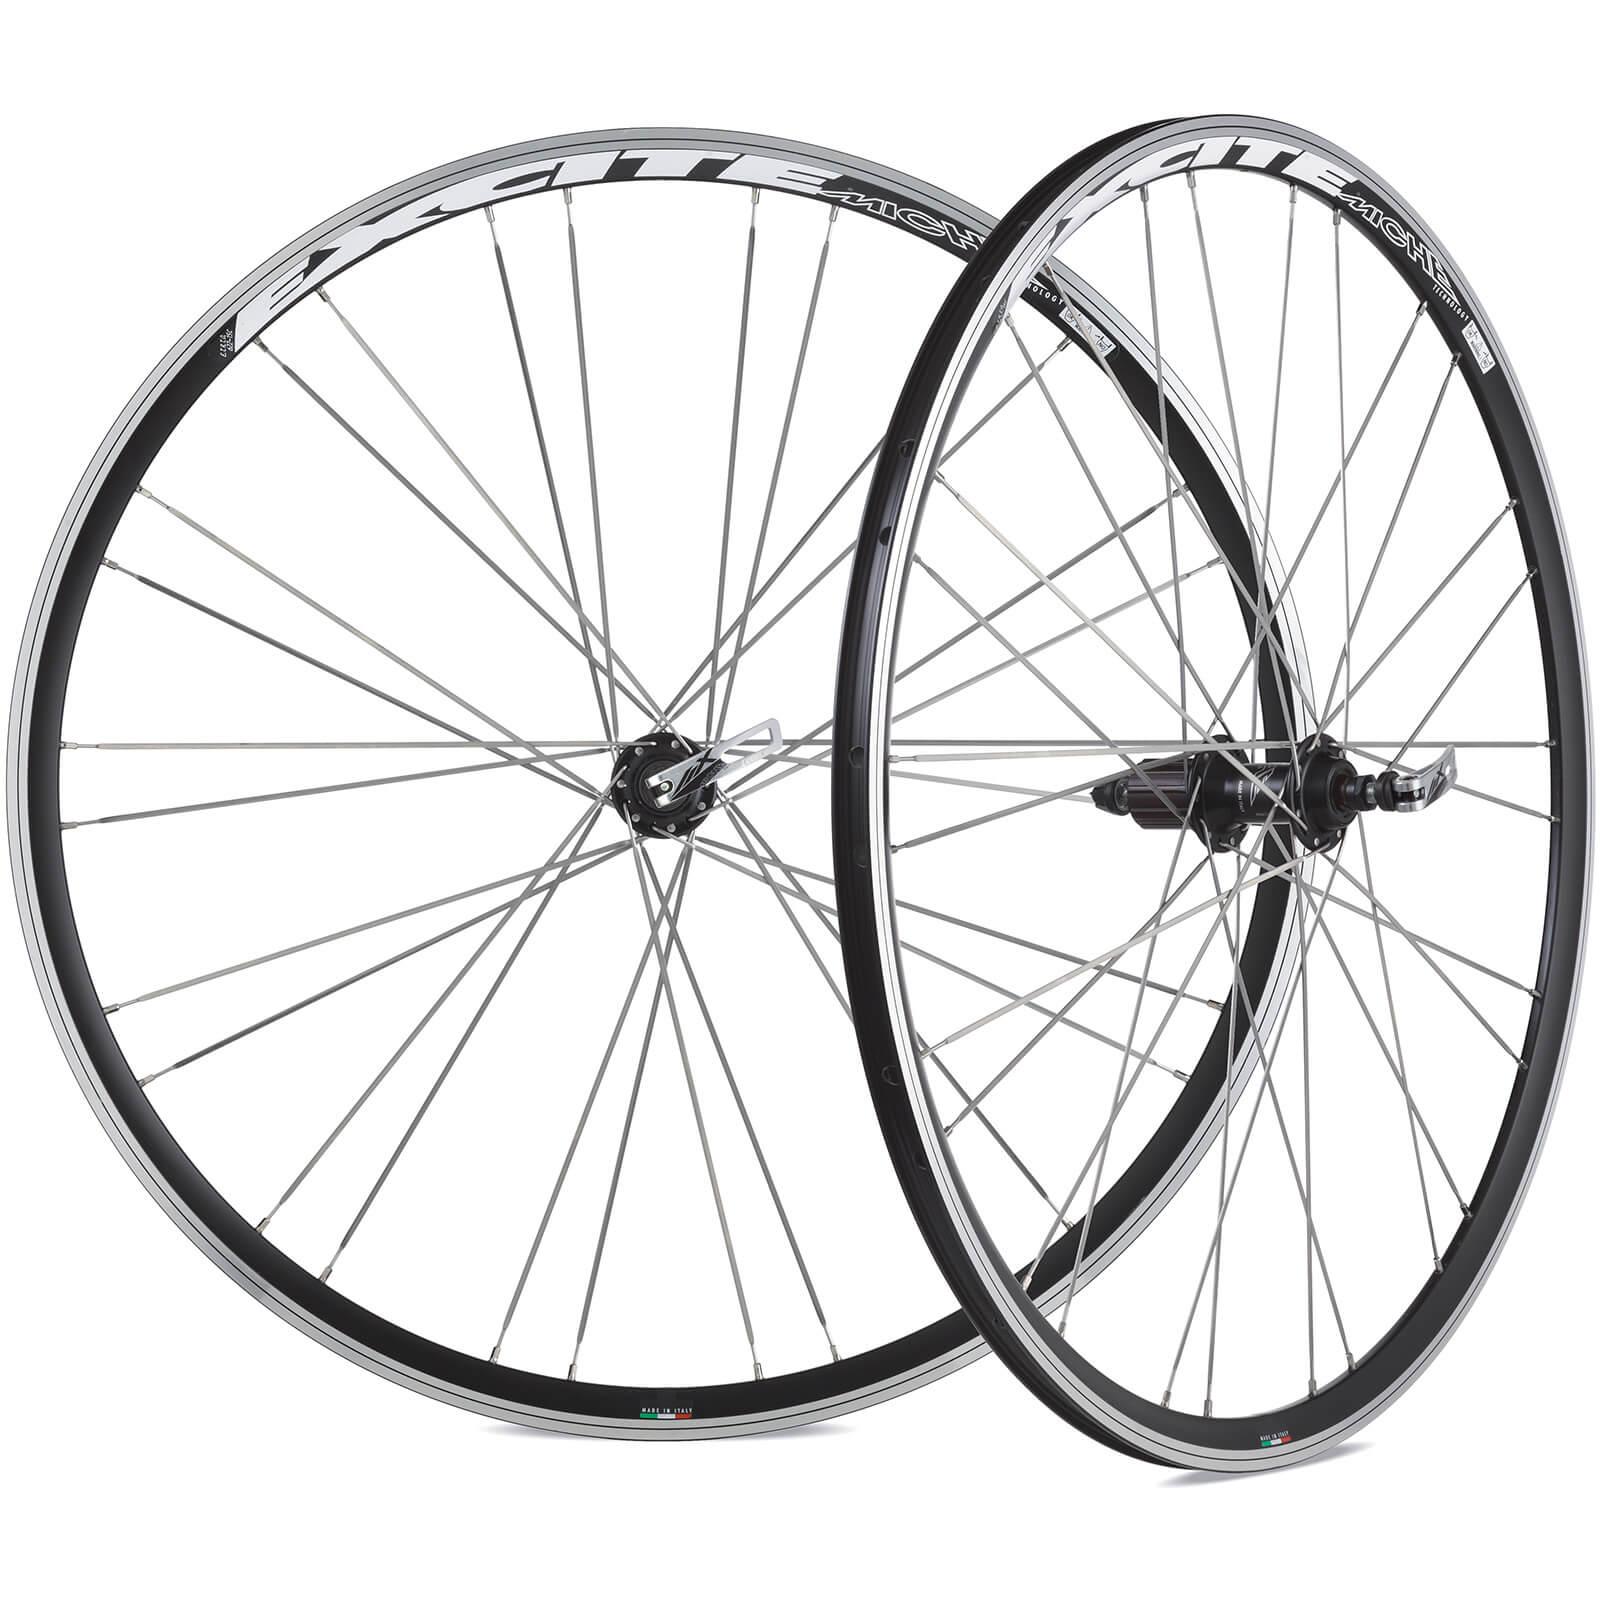 Miche Excite Wheelset - 700c - Black - Shimano